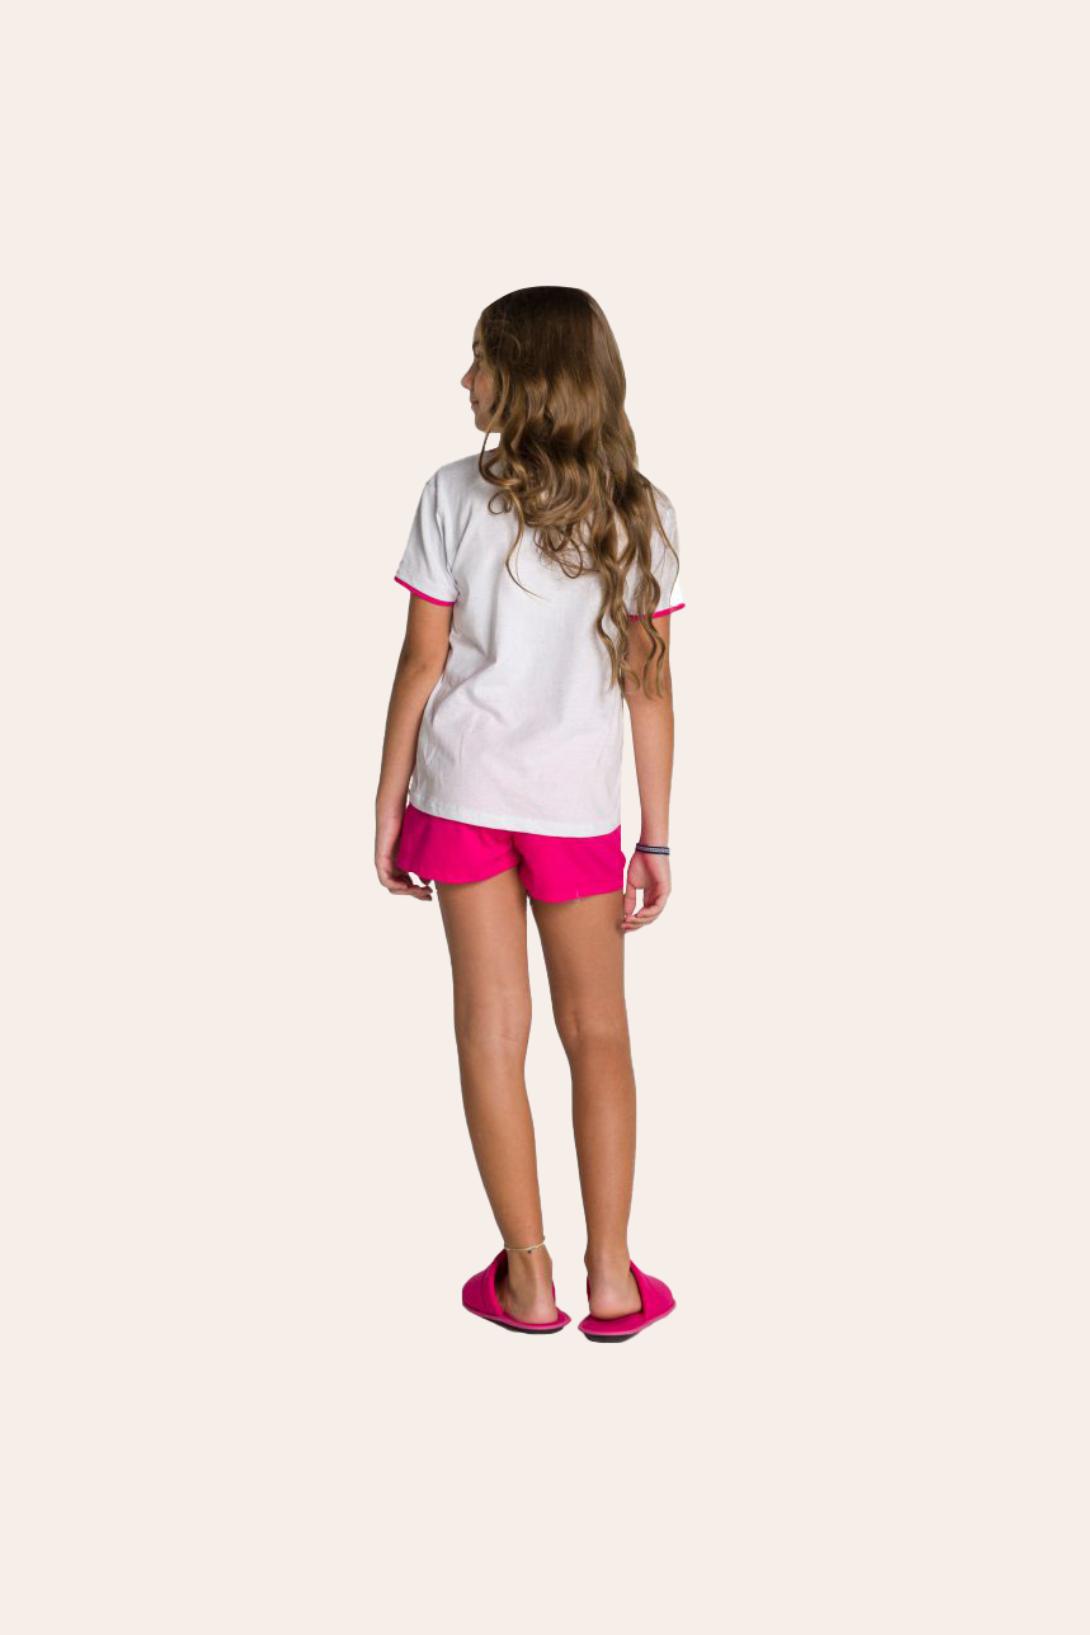 203/B - Pijama Juvenil Feminino em Botonê Estampa Glitter - Mãe e Filha